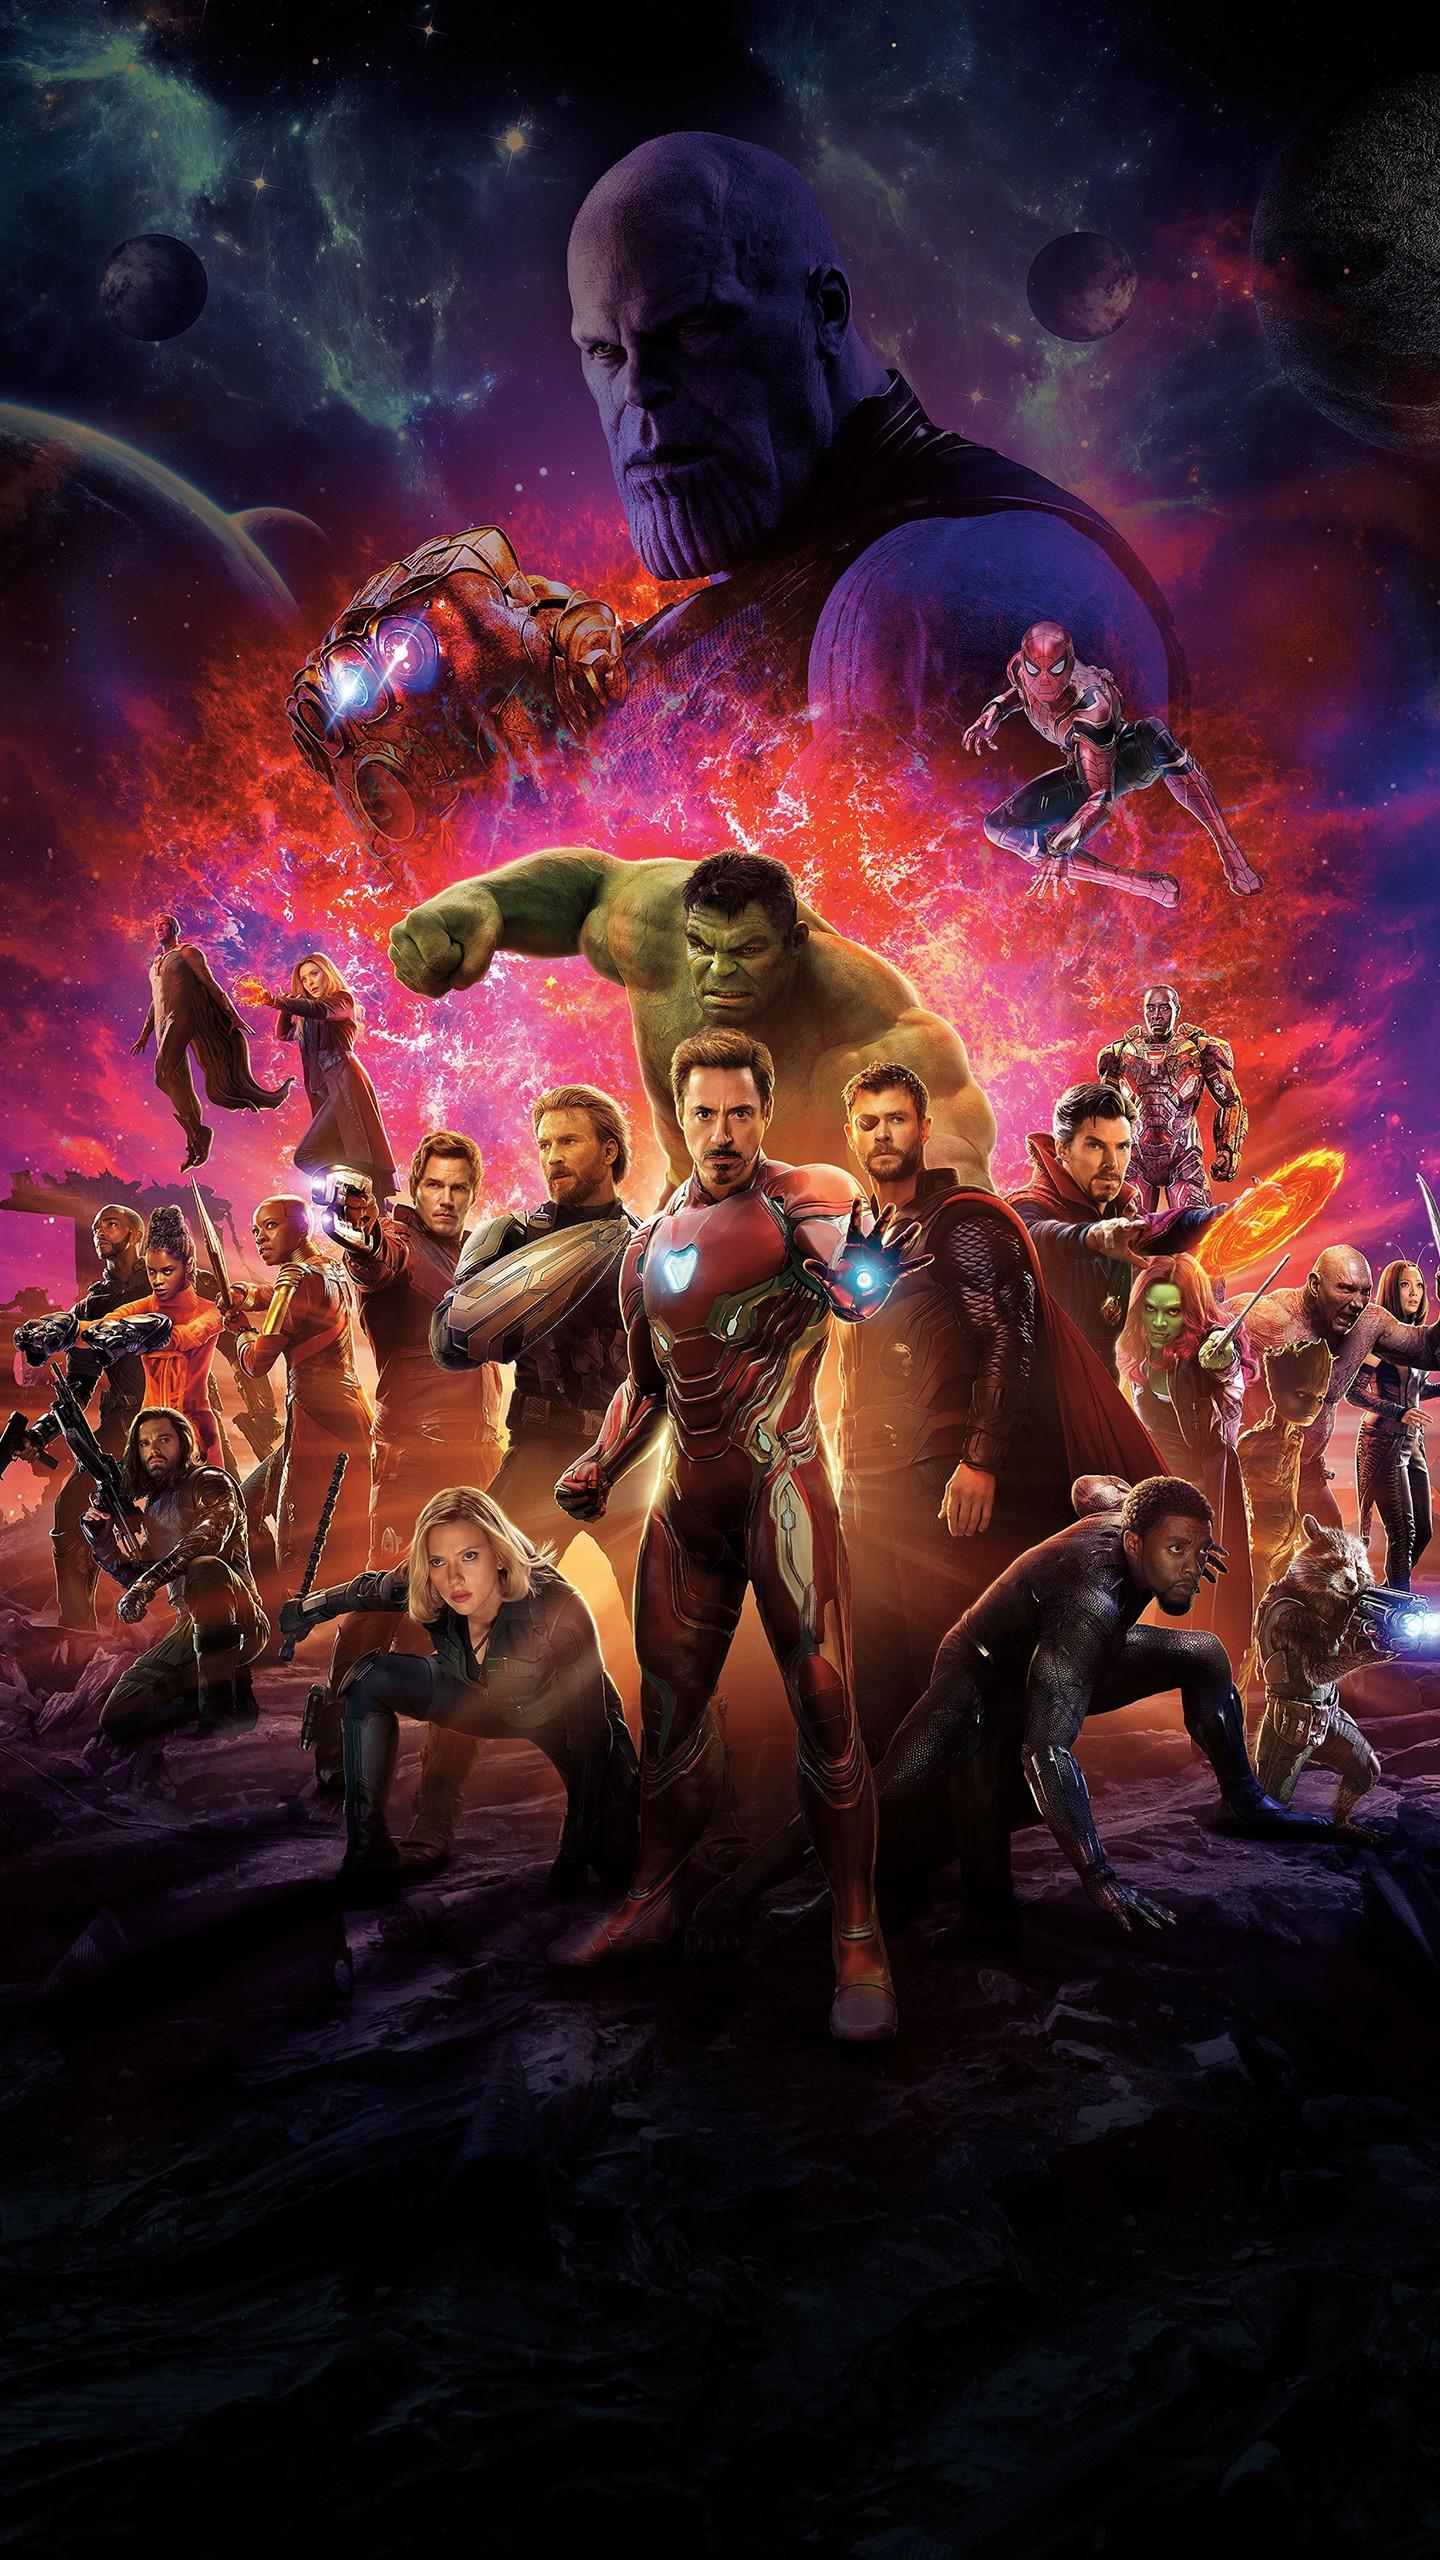 Superhero Wallpaper Iphone X Avengers Infinity War Superheroes Cast 4k 8k Wallpapers